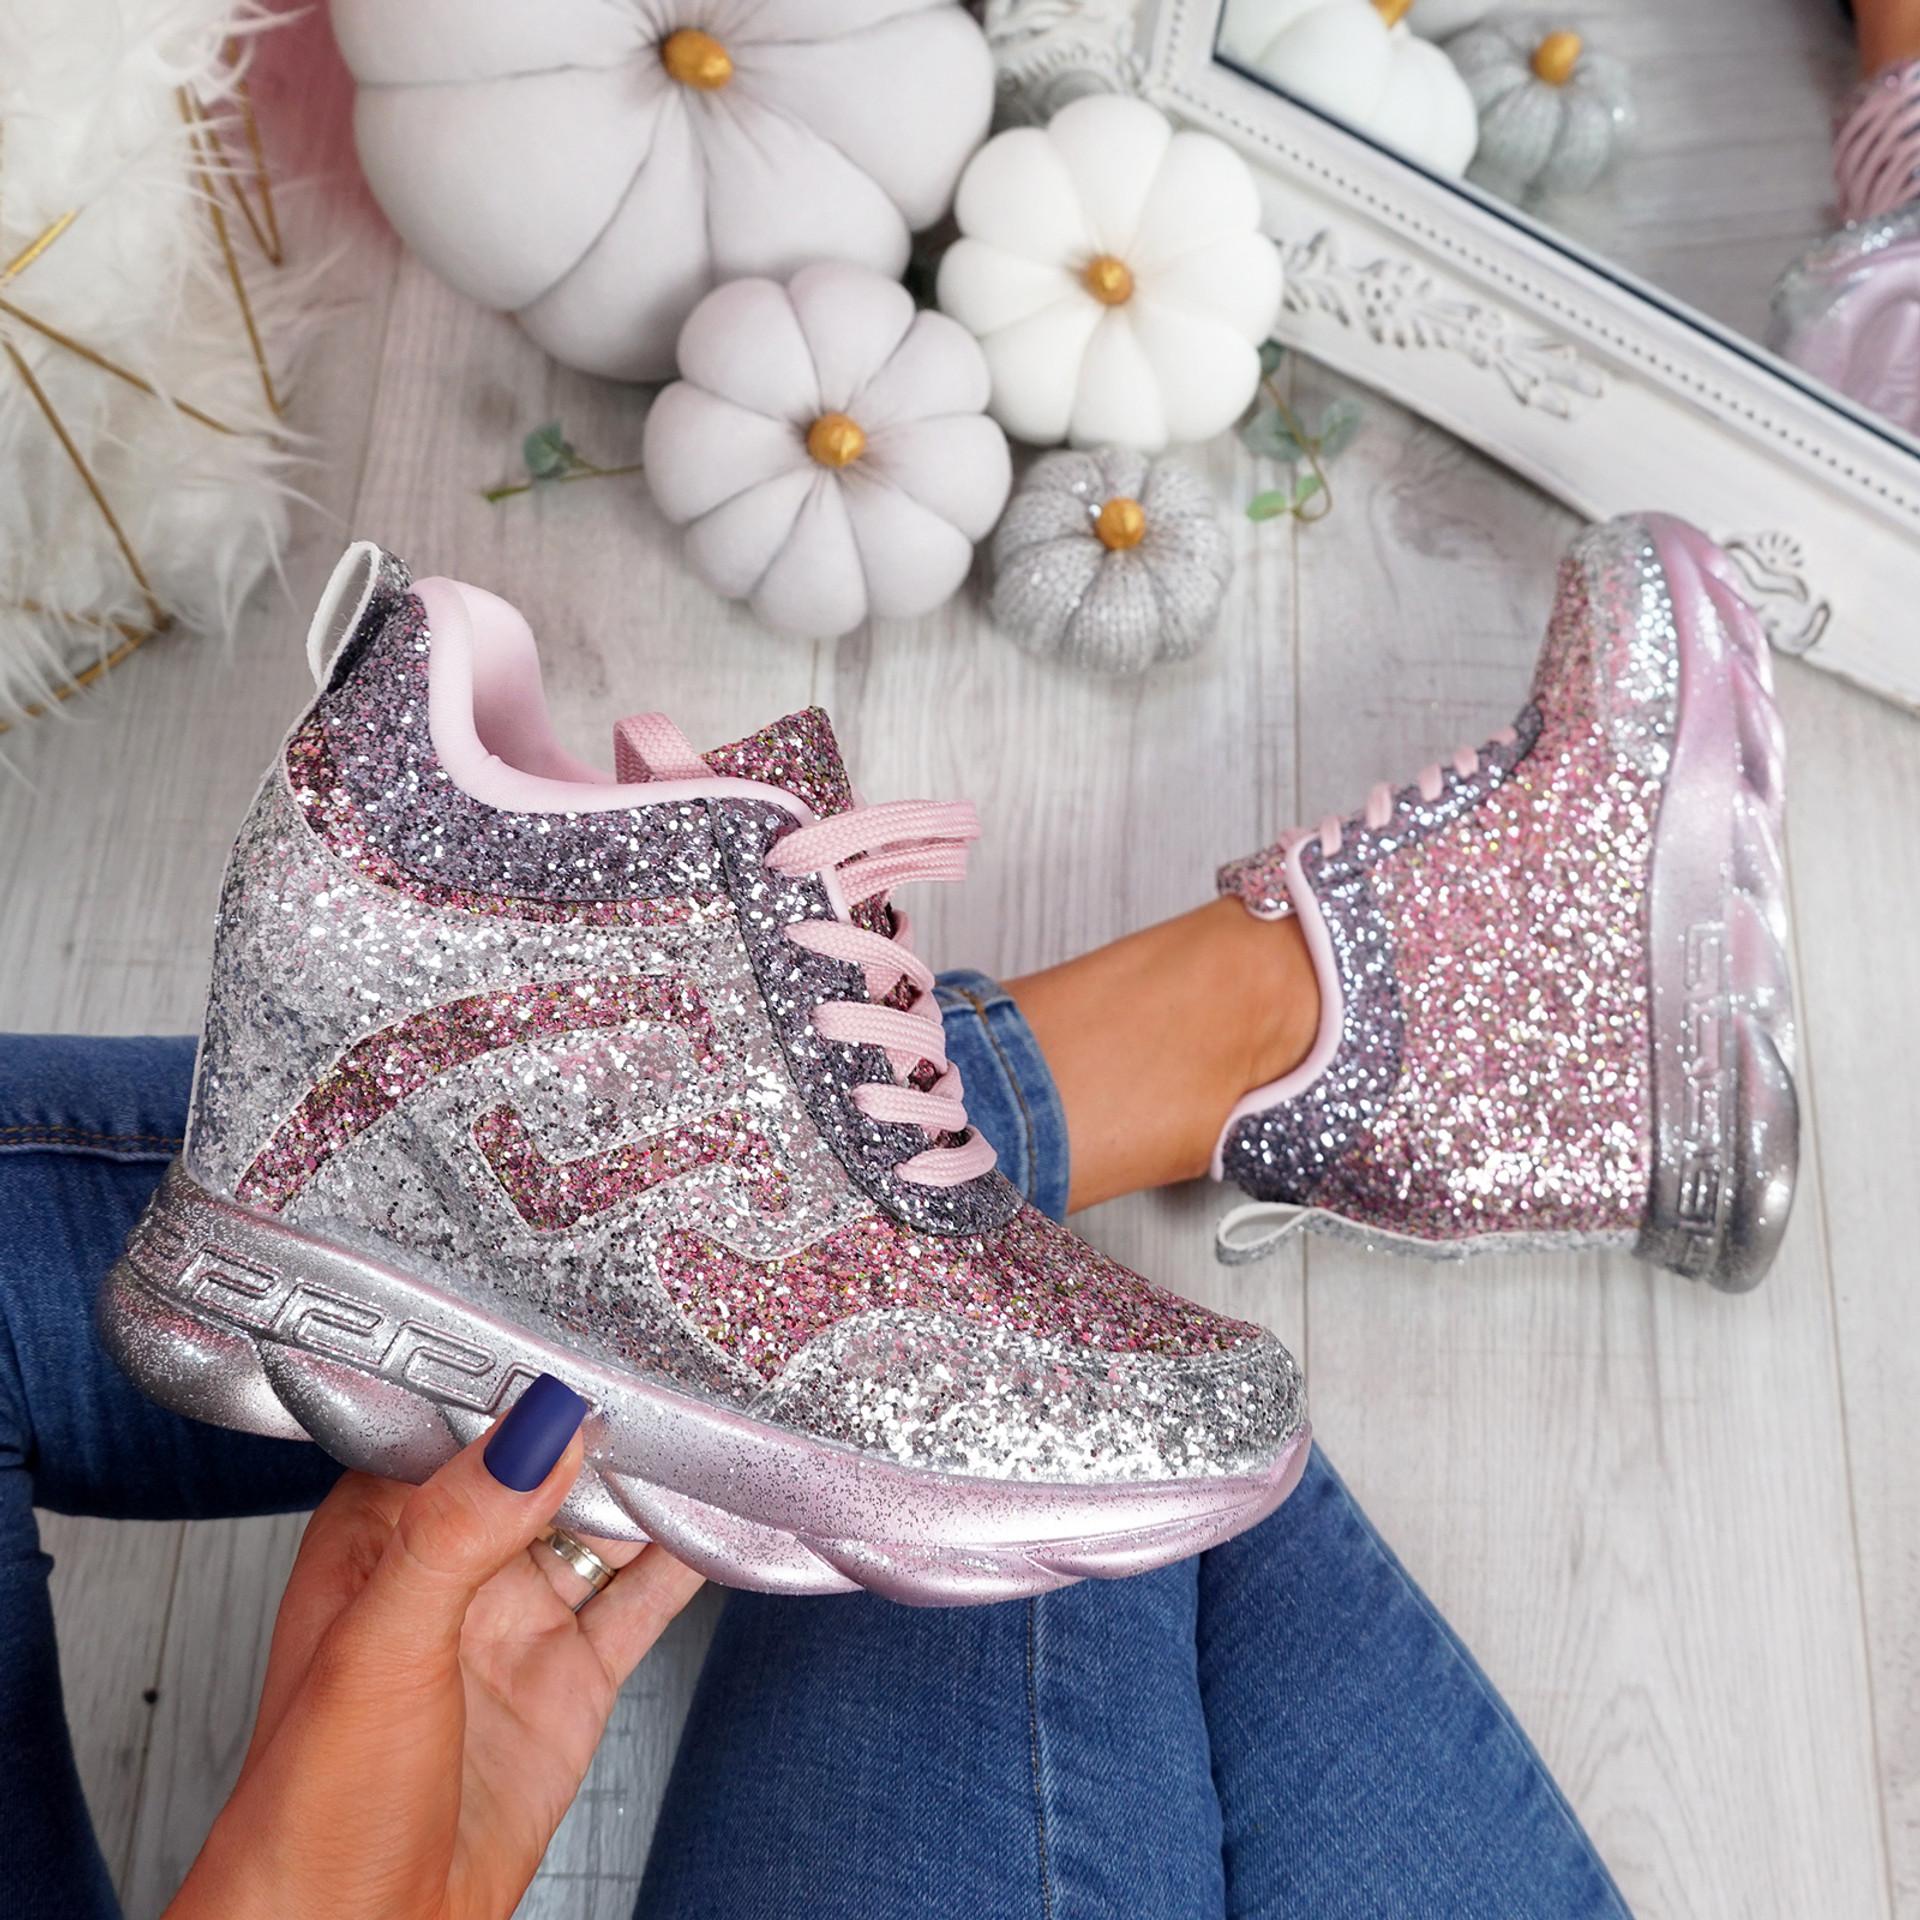 Disso Silver Glitter Wedge Trainers